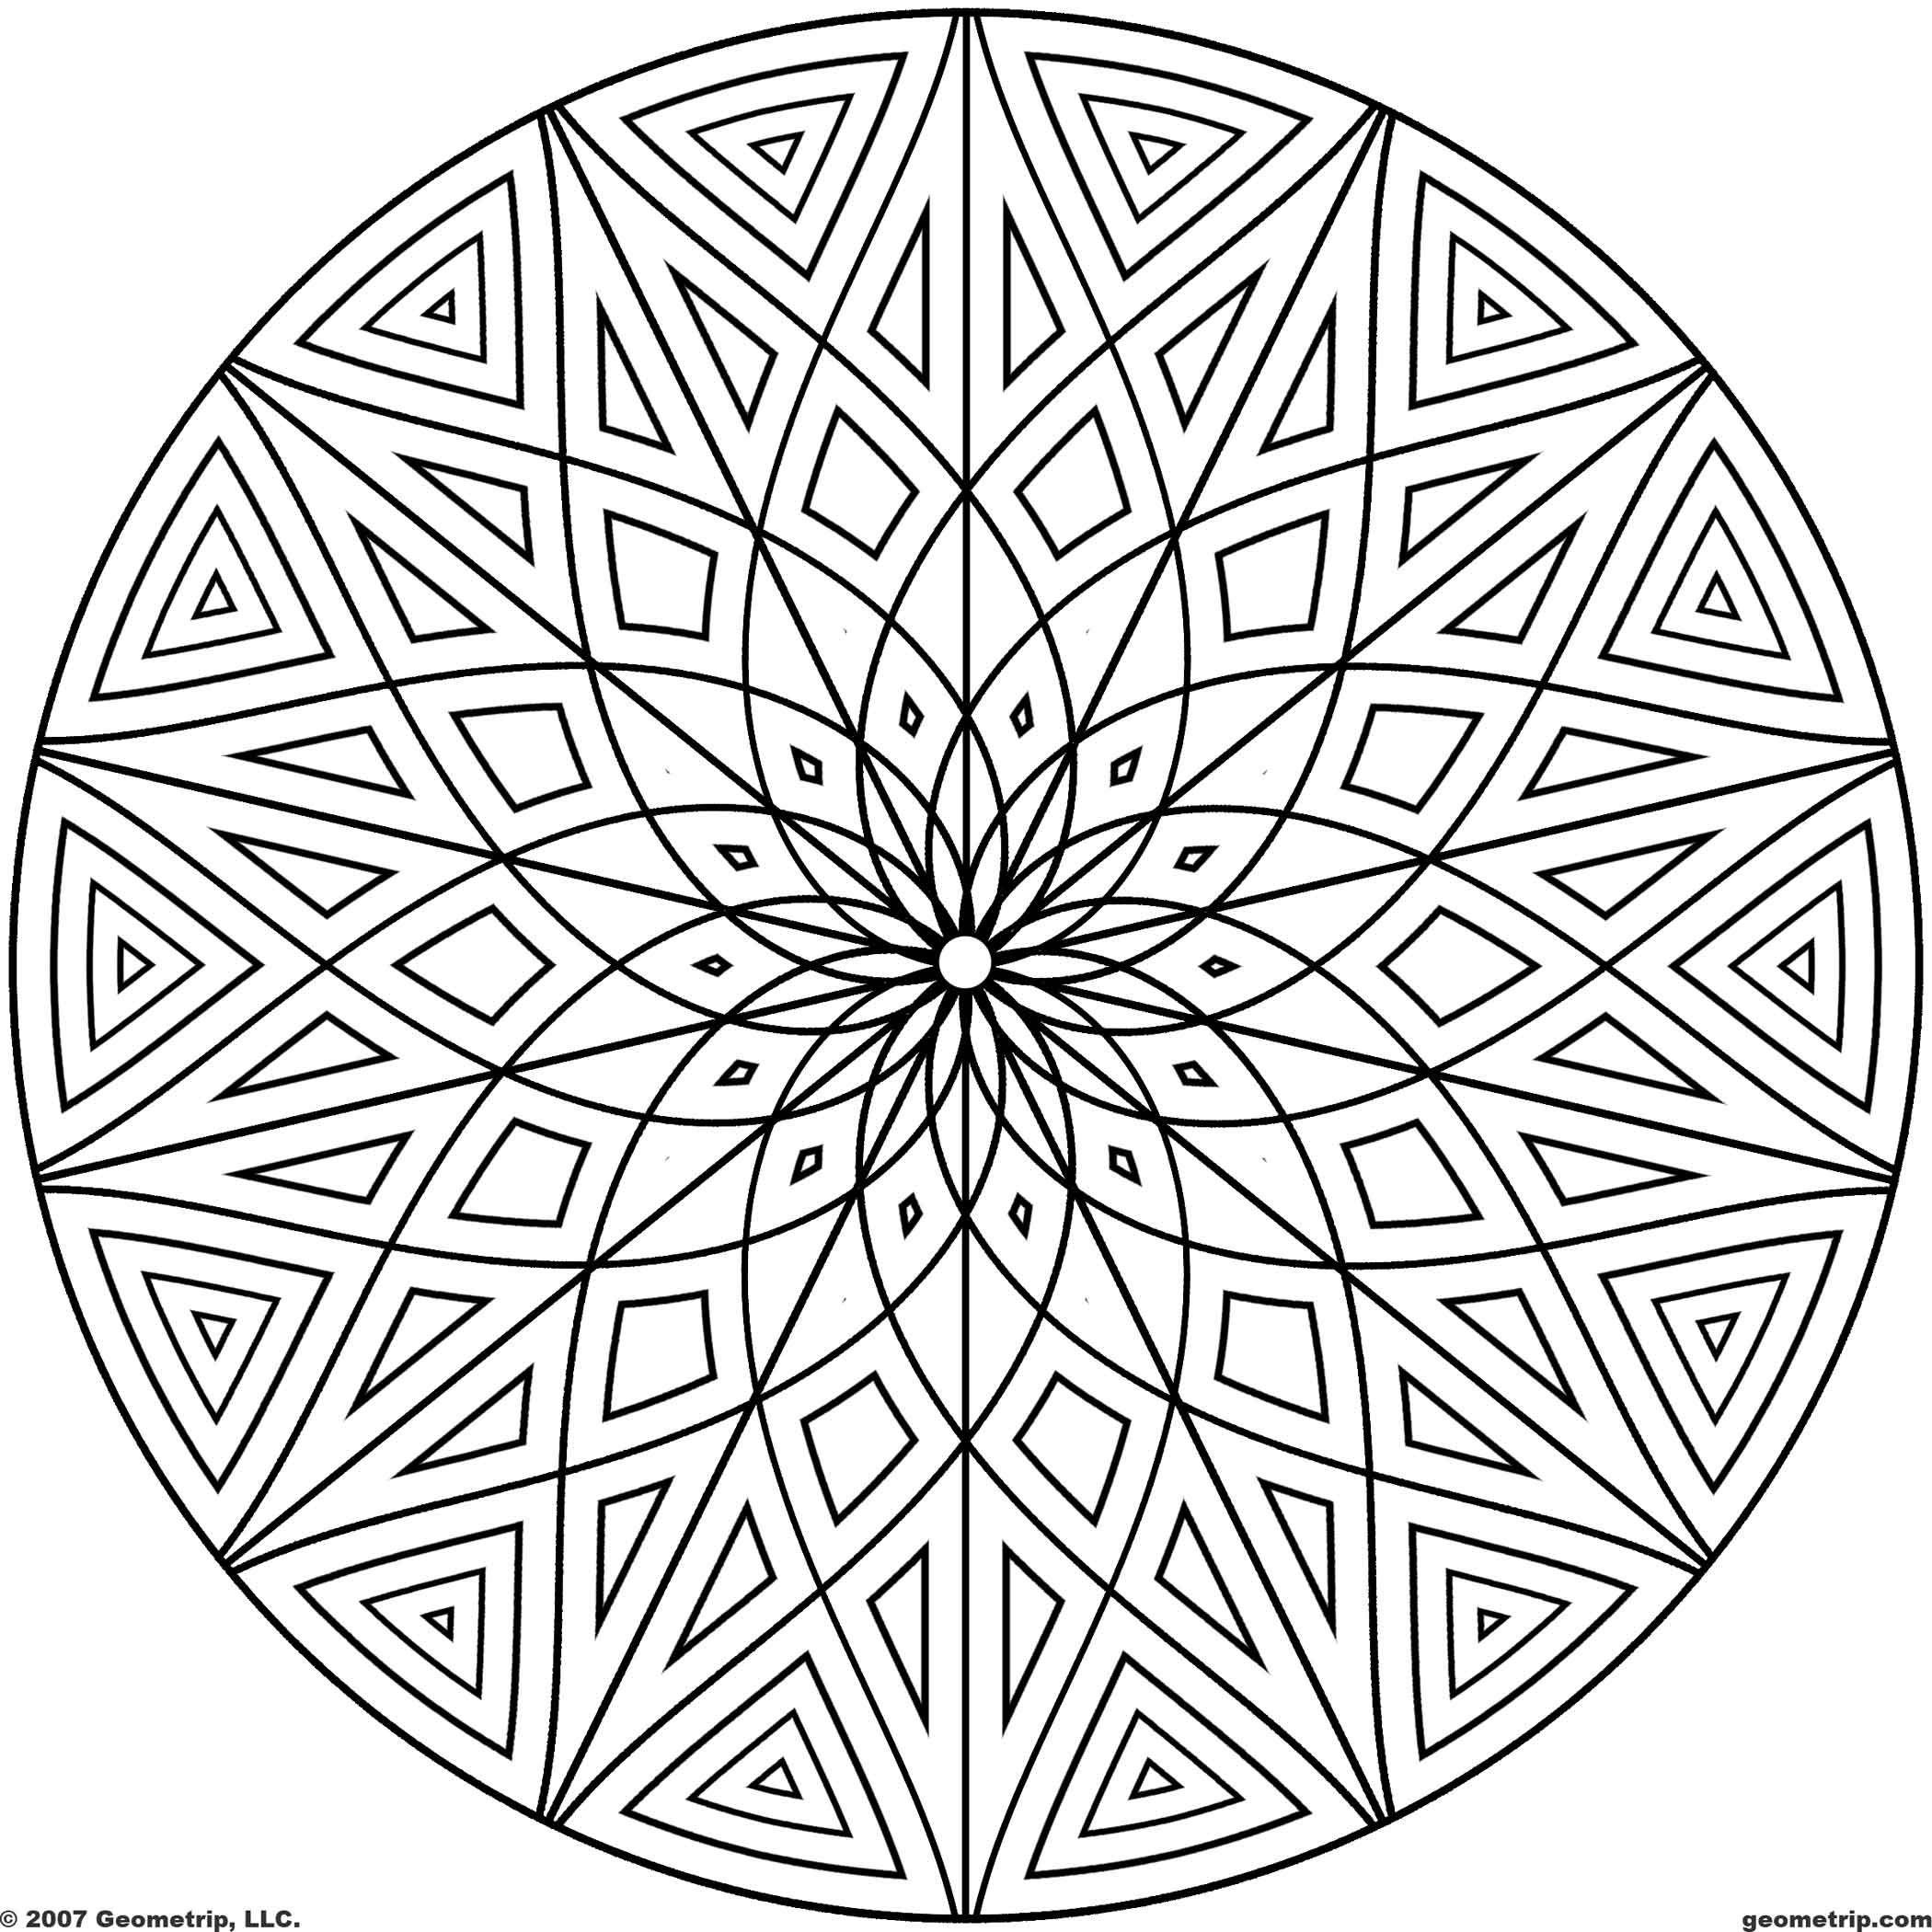 Geometrip Images Designs Circles Set1 Large